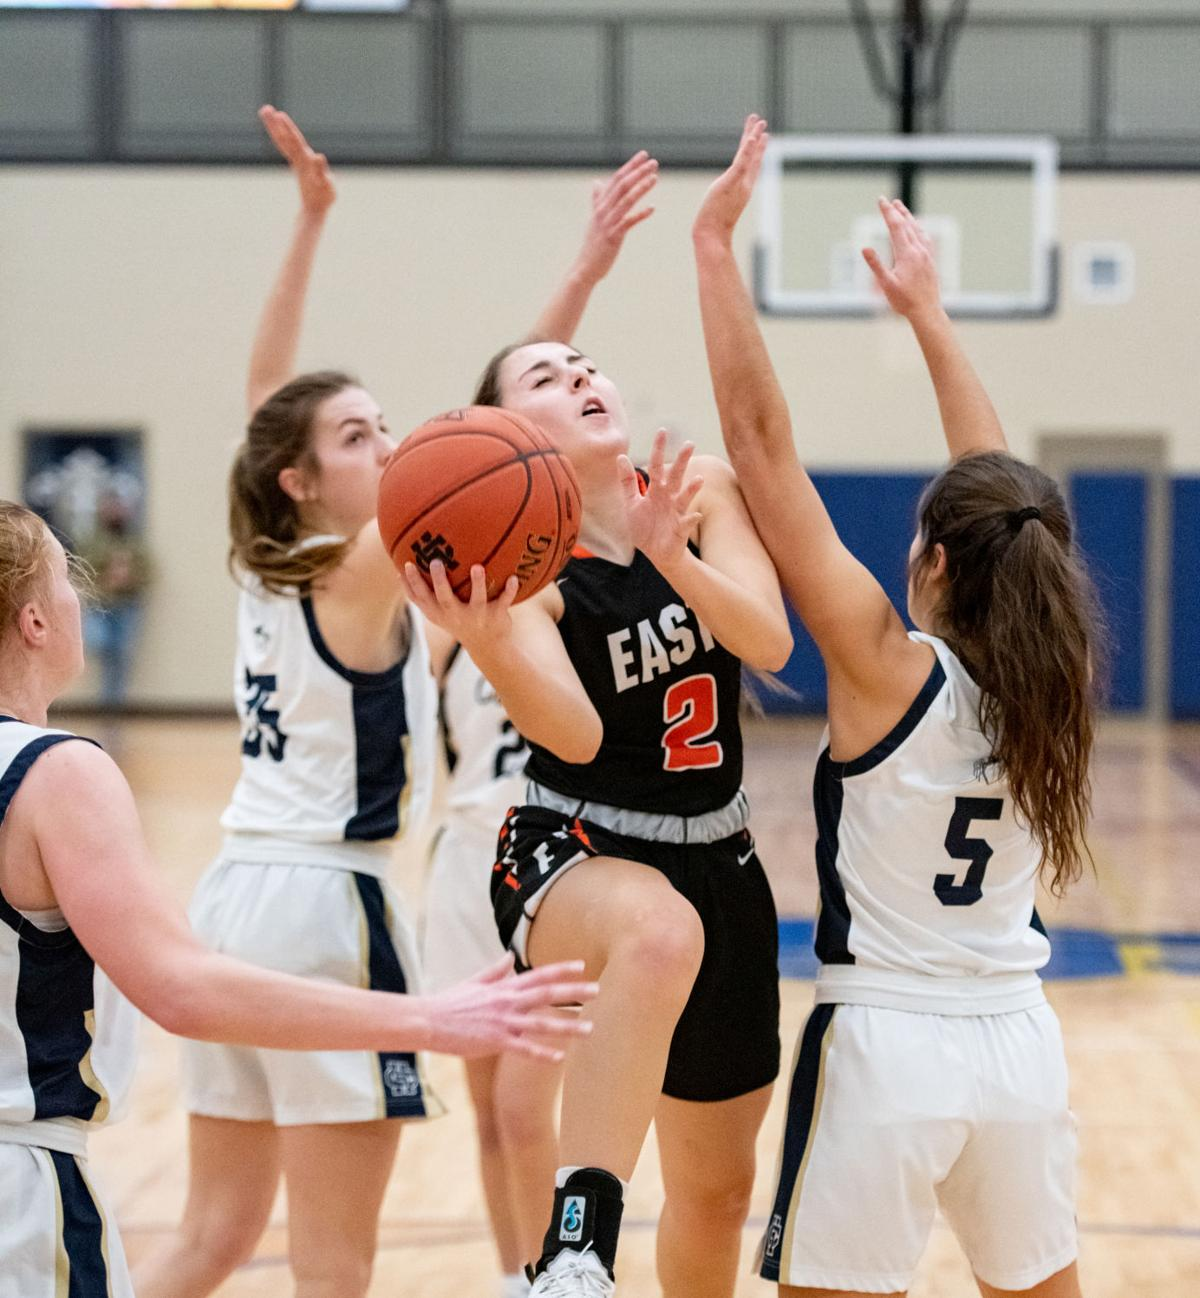 East vs Heelan basketball